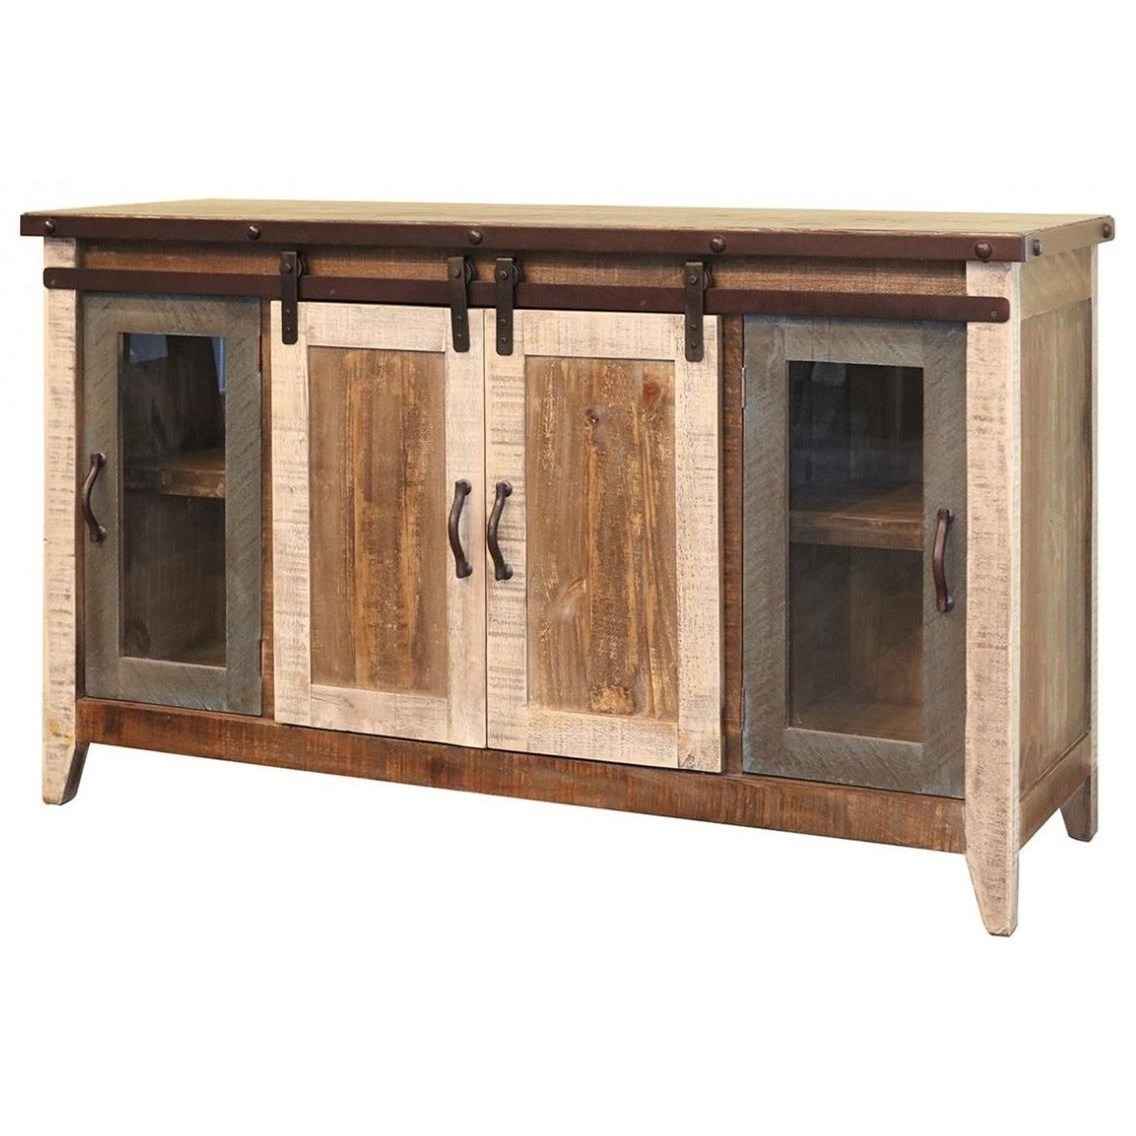 International Furniture Direct 900 Antique Rustic 60 Tv